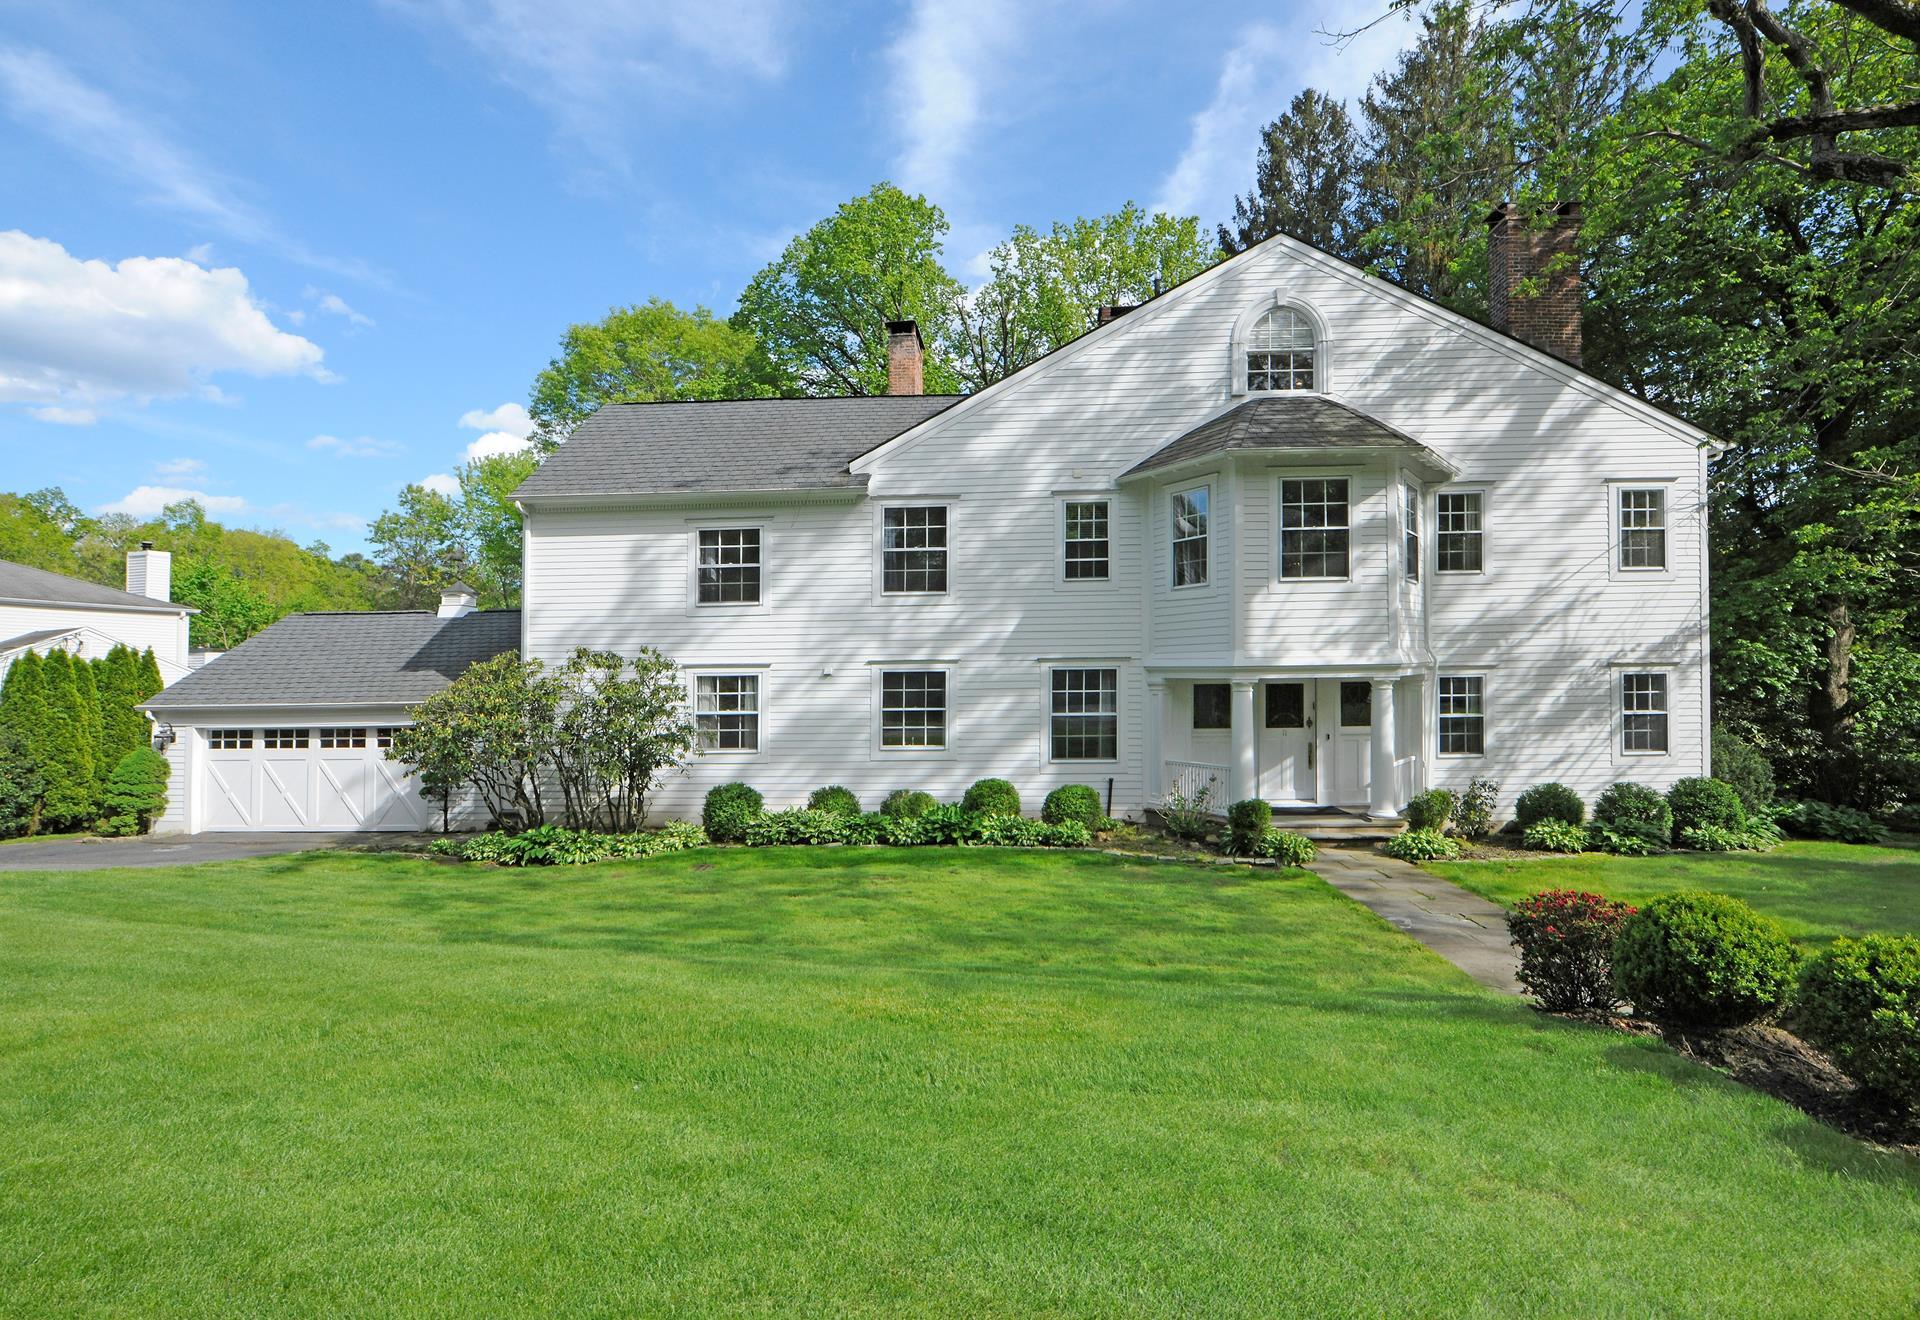 White Plains Real Estate & Homes for Sale   Douglas Elliman